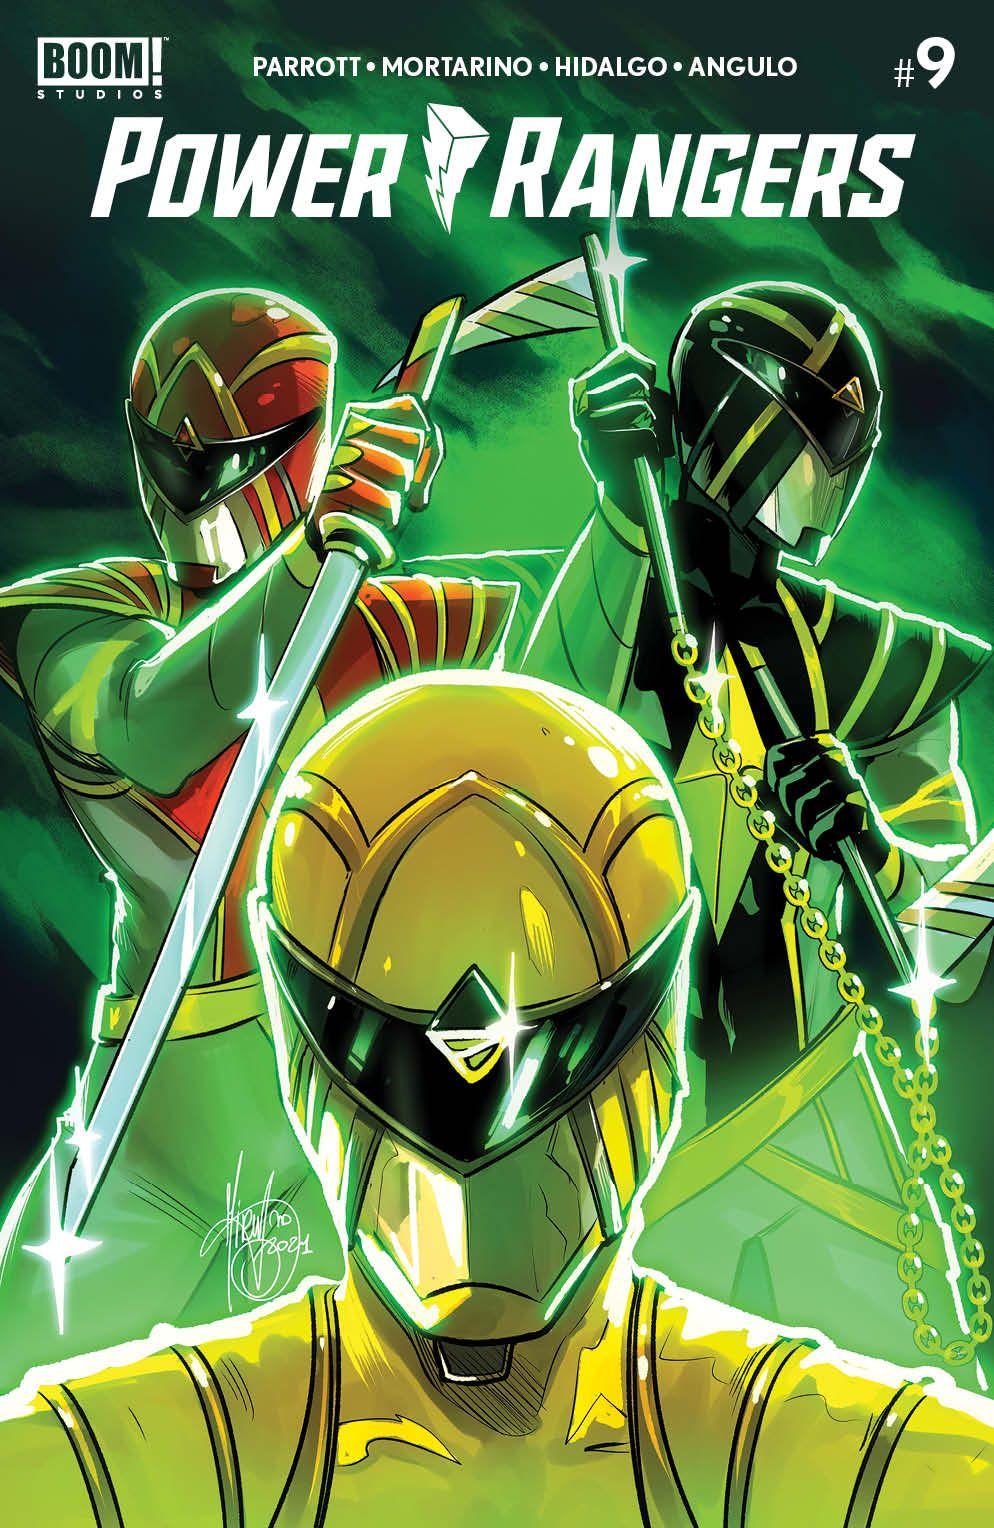 PowerRangers_009_Cover_F1_Variant ComicList Previews: POWER RANGERS #9